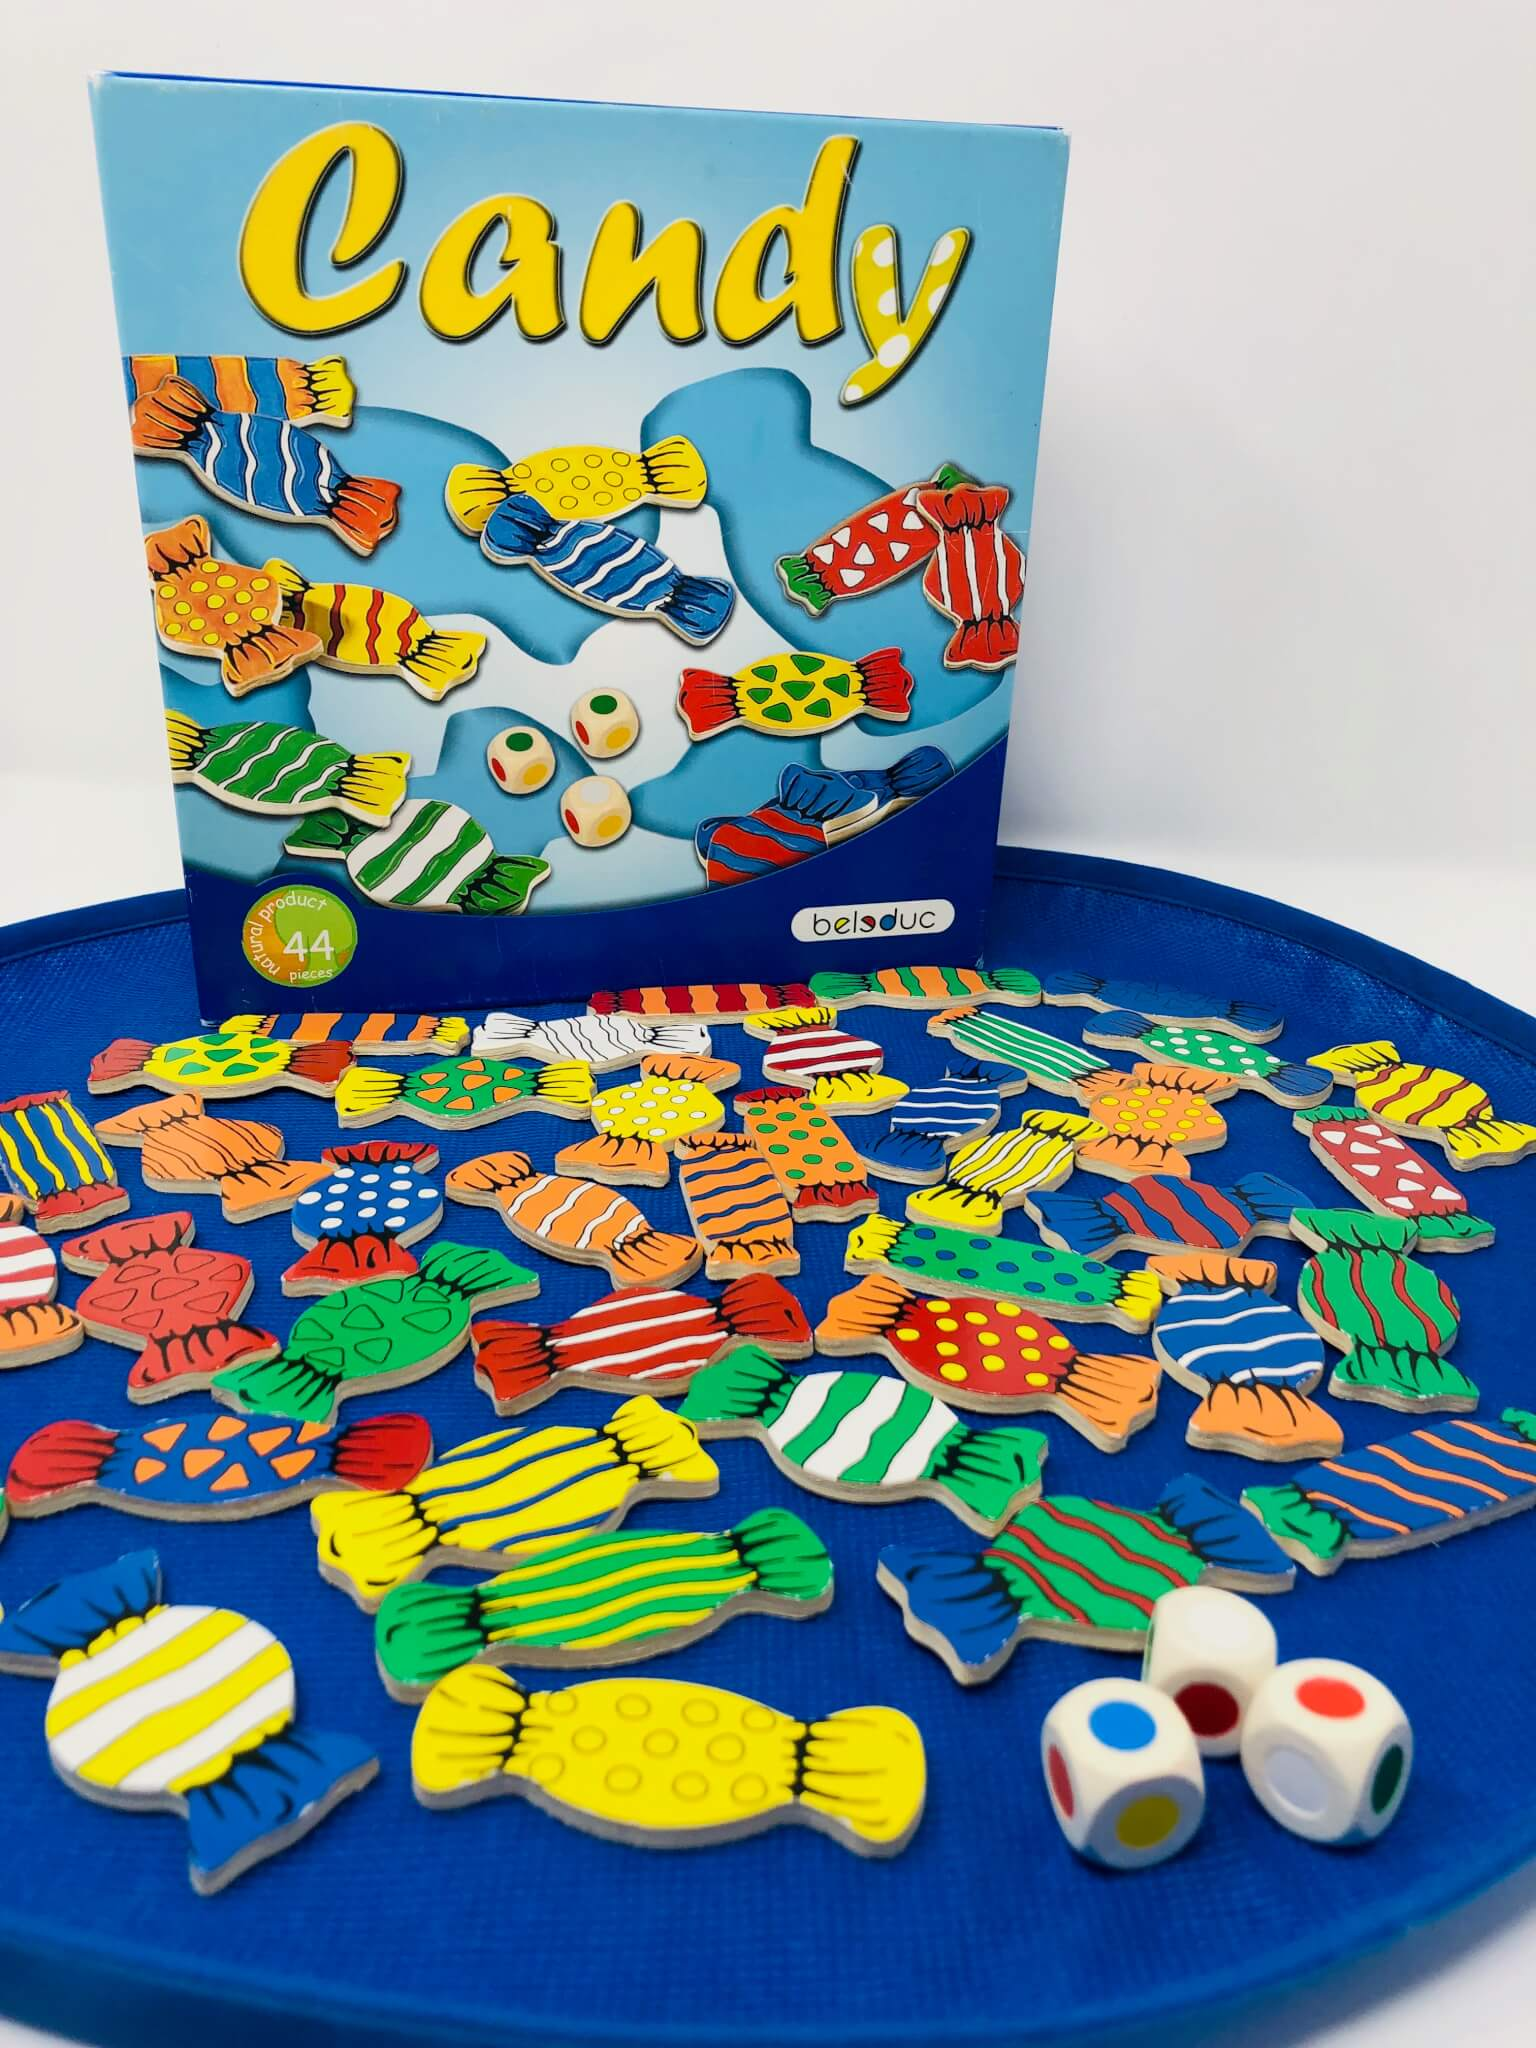 Candy (Beleduc)